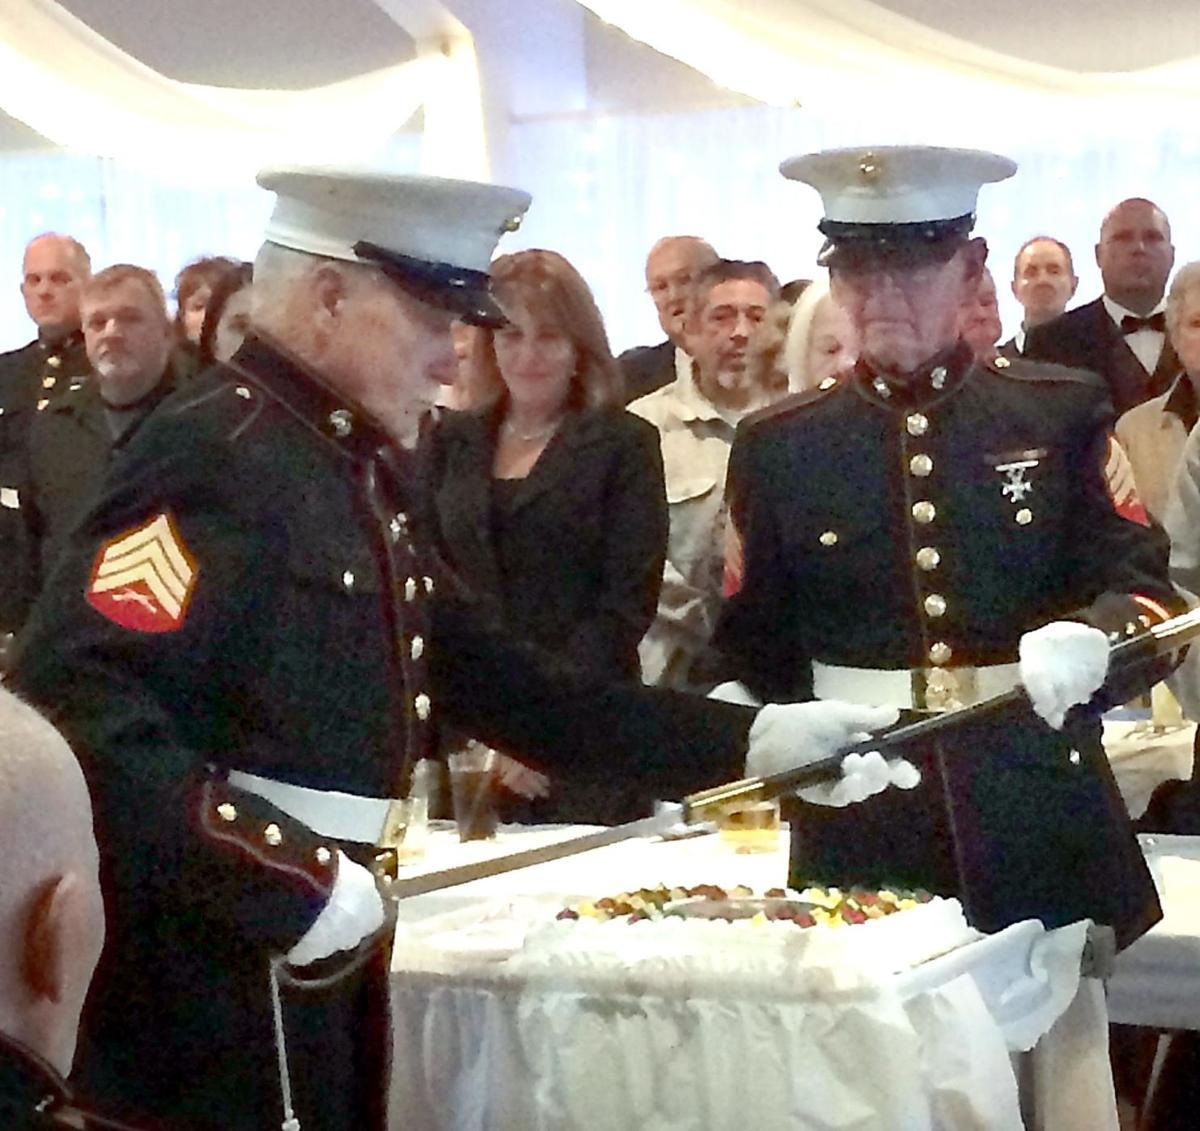 Veterans cake cutting